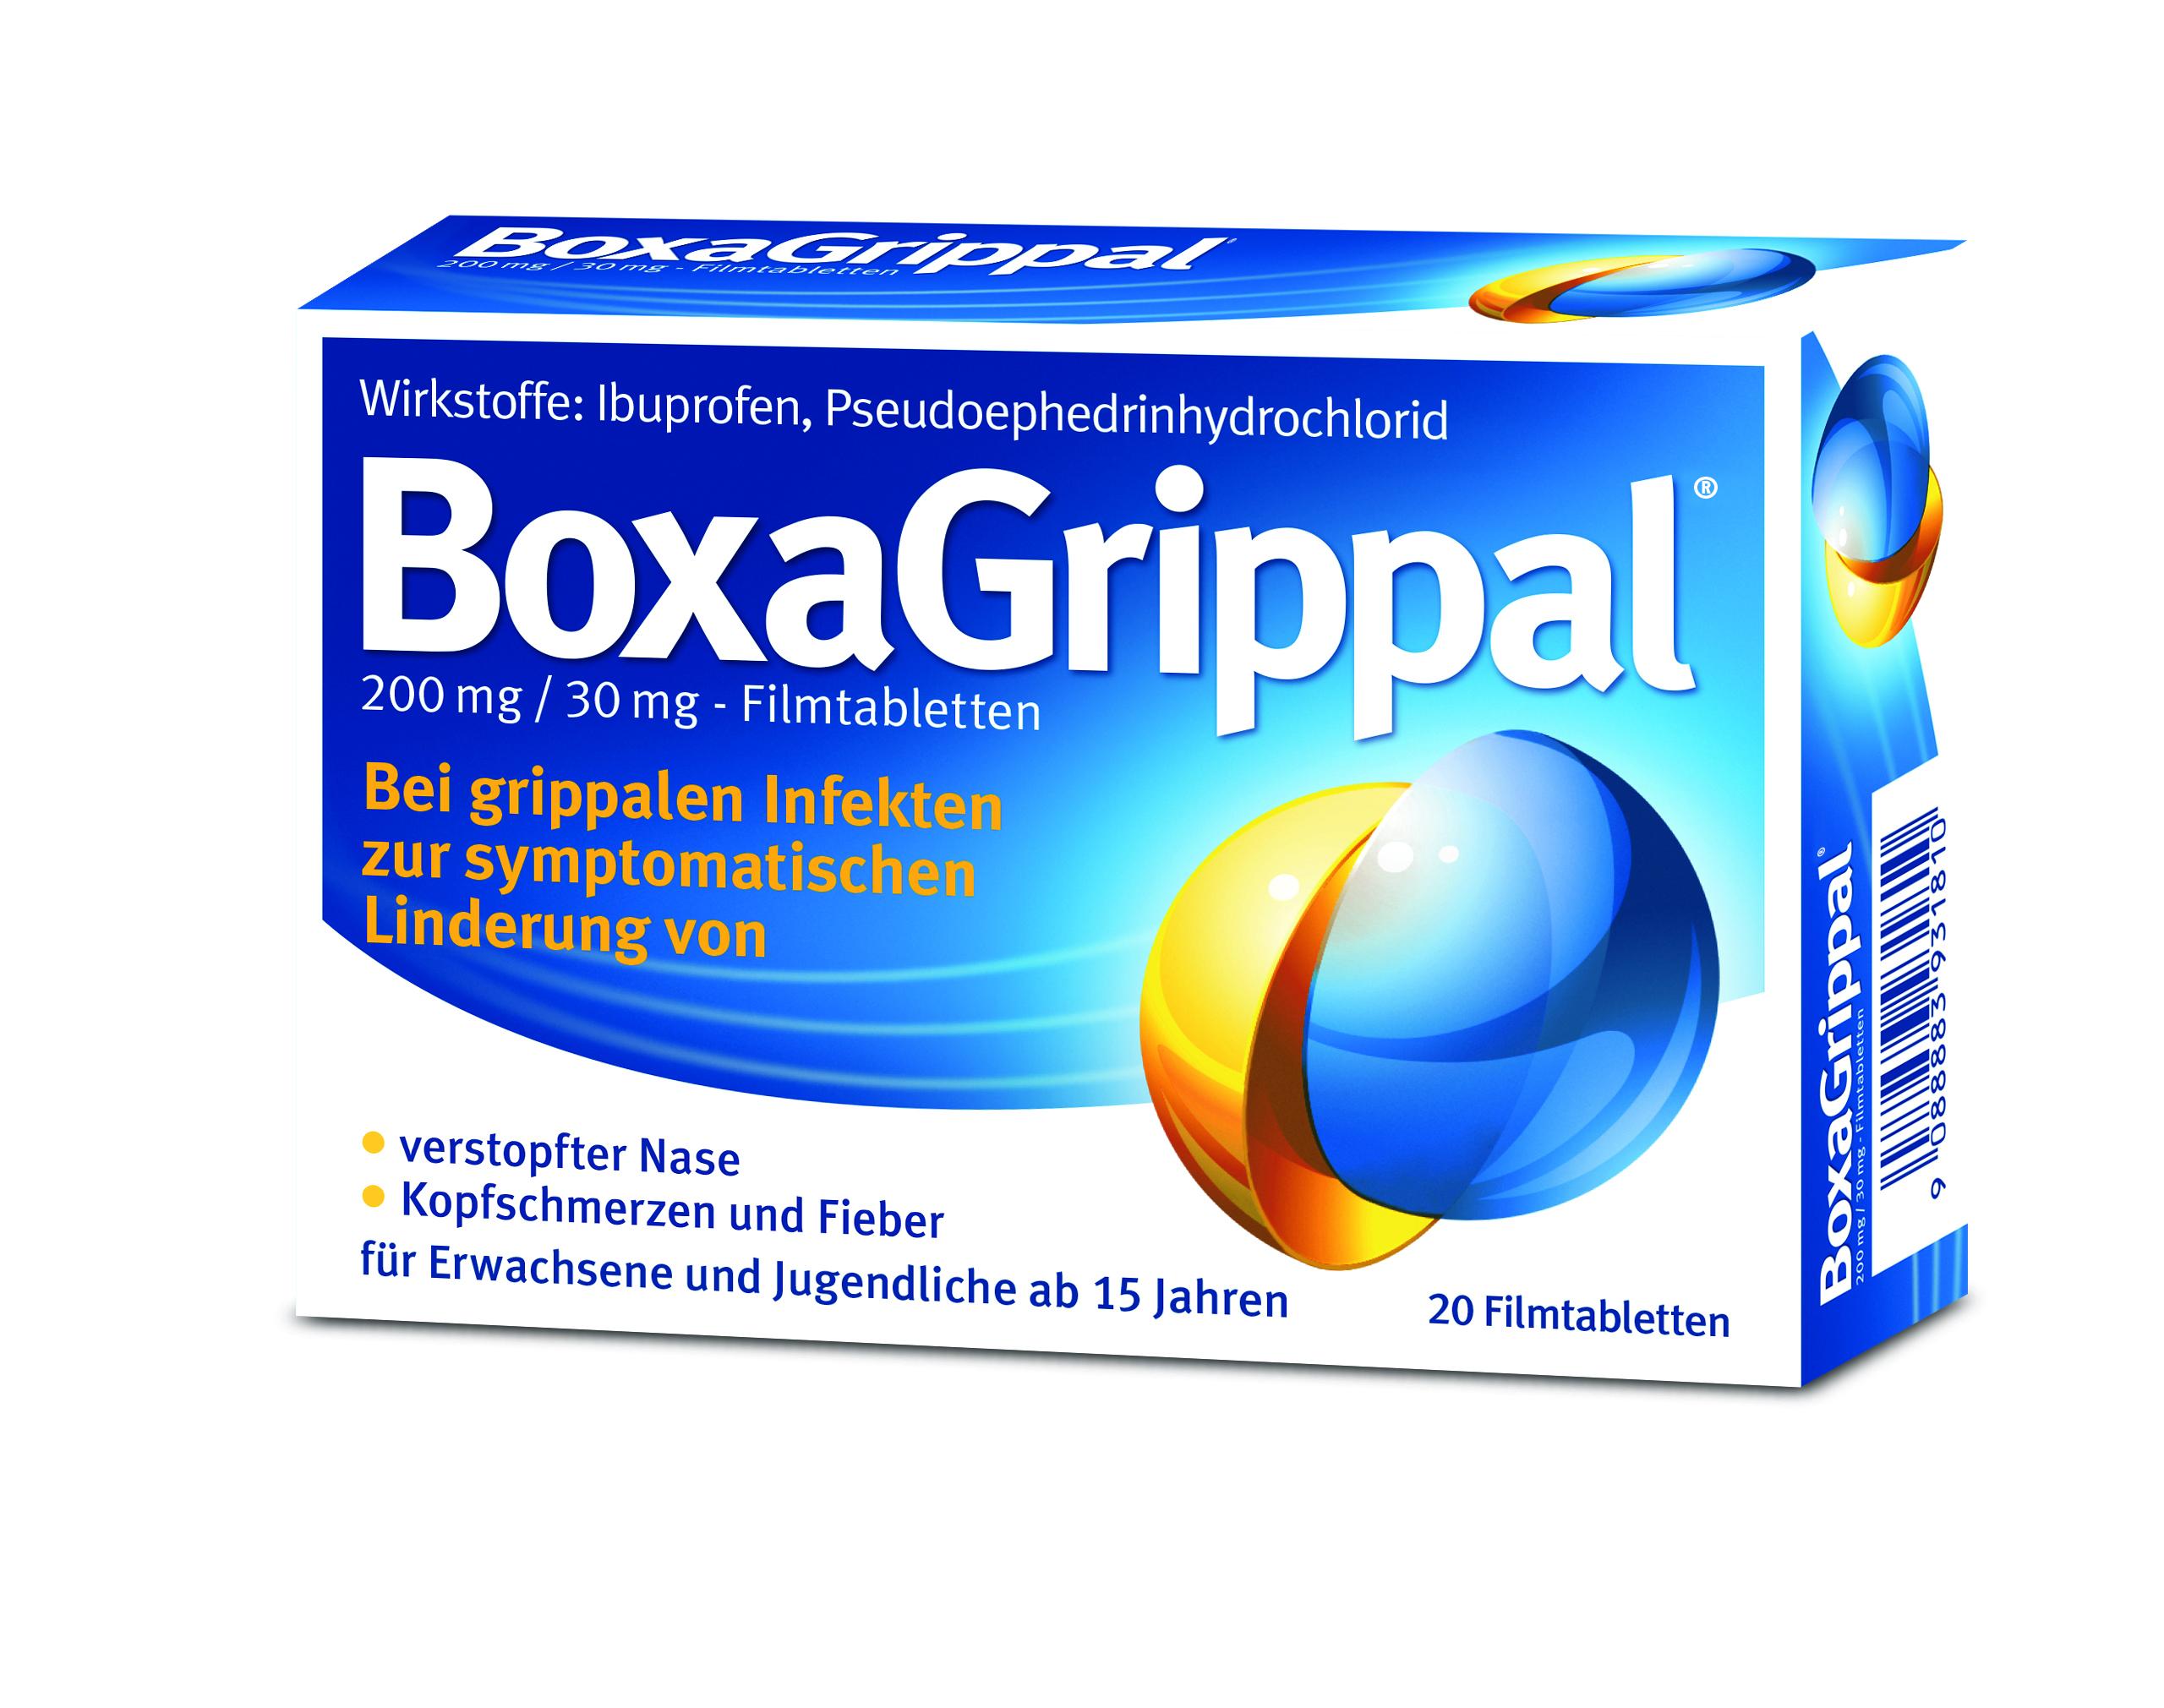 BoxaGrippal 200 mg/30 mg - Filmtabletten